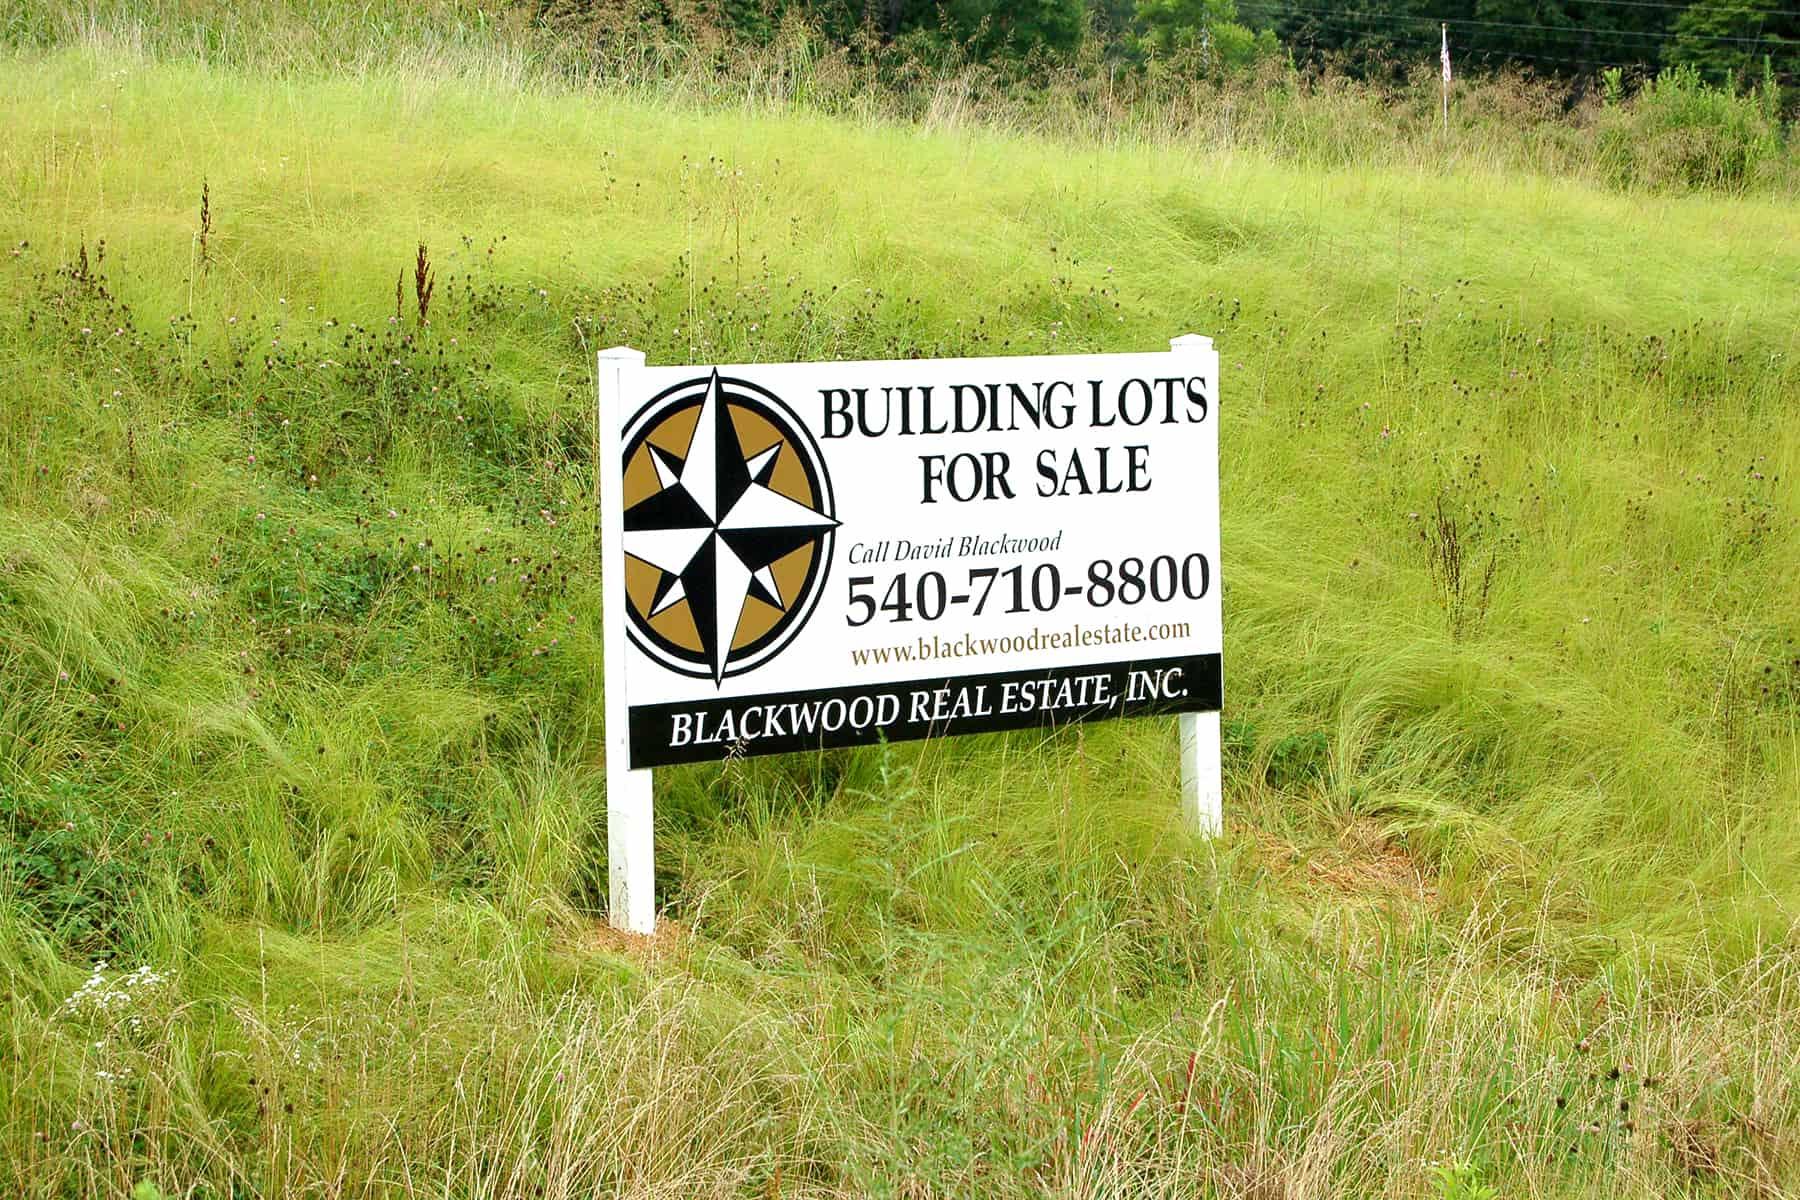 Fredericksburg Commercial Real Estate Agency